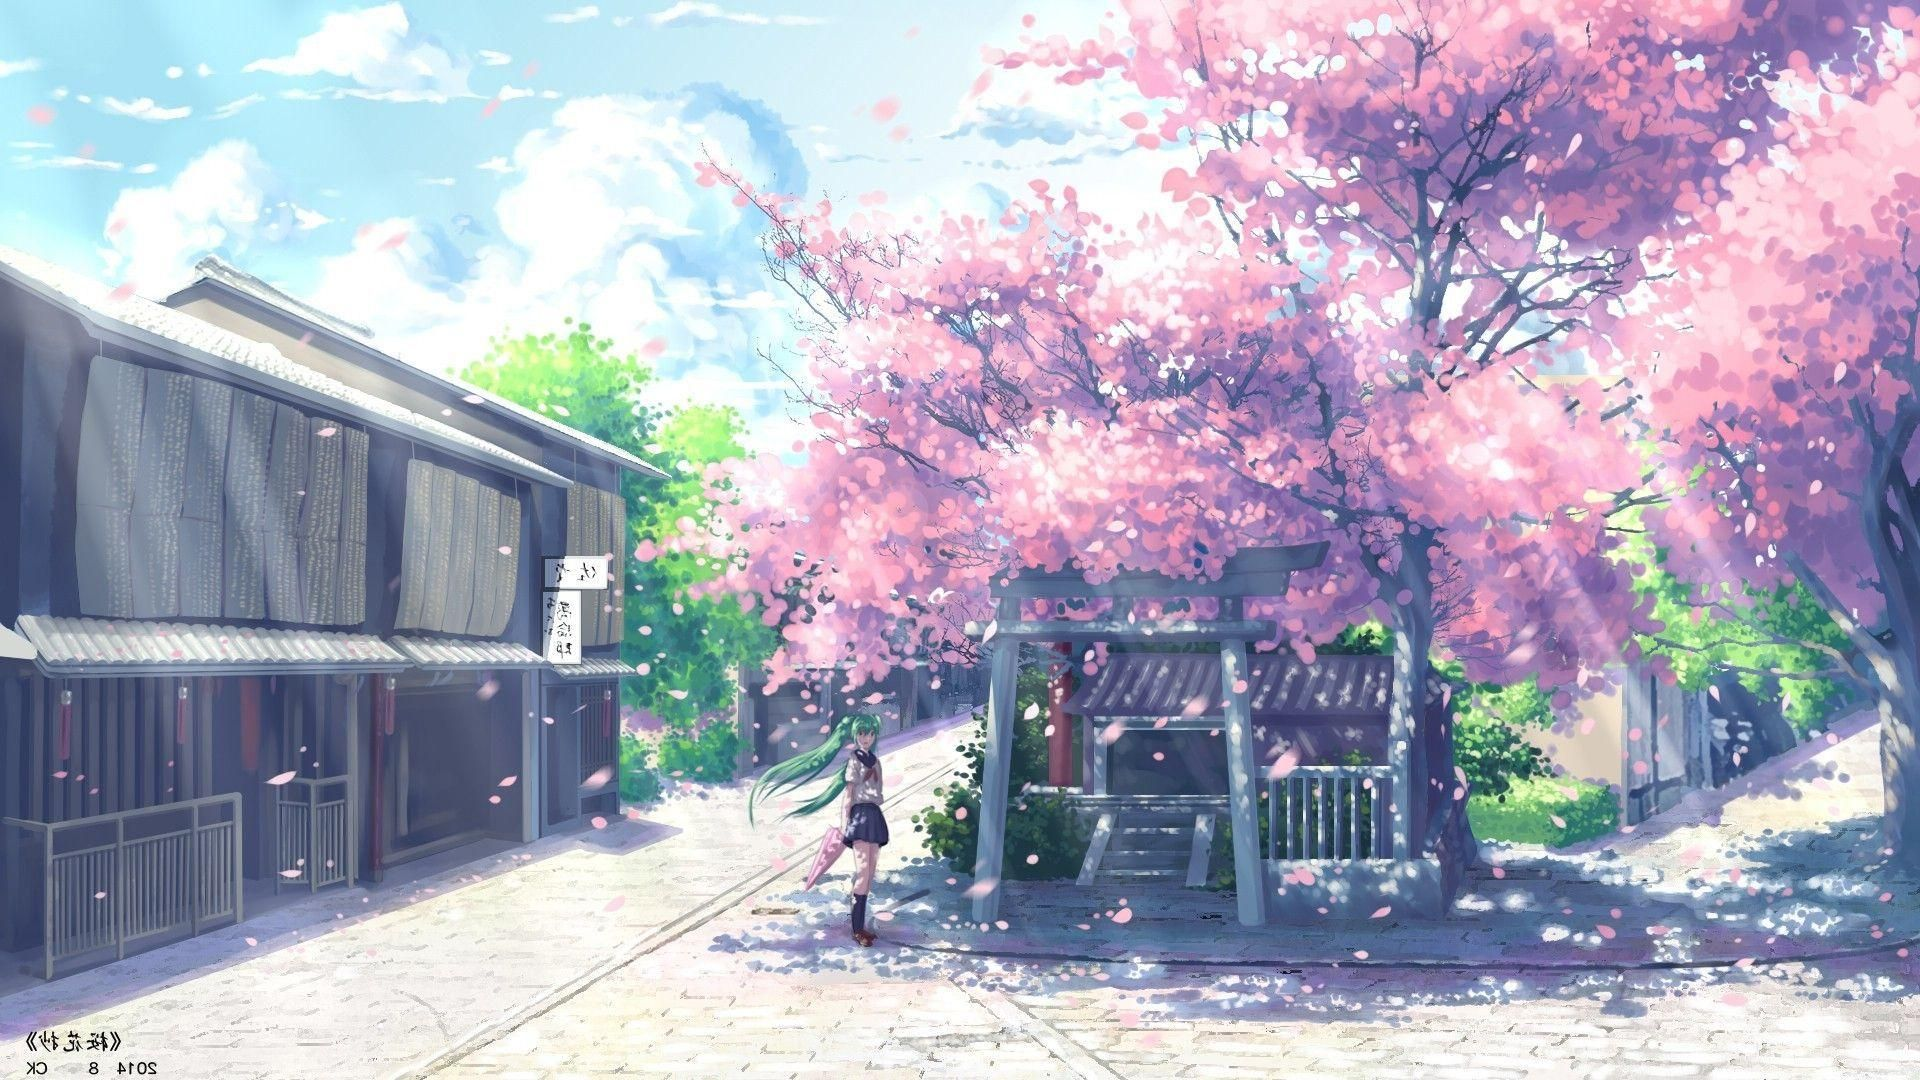 11 Aesthetic Anime Wallpaper For Computer Orochi Wallpaper In 2020 Anime Backgrounds Wallpapers Anime Scenery Anime Cherry Blossom